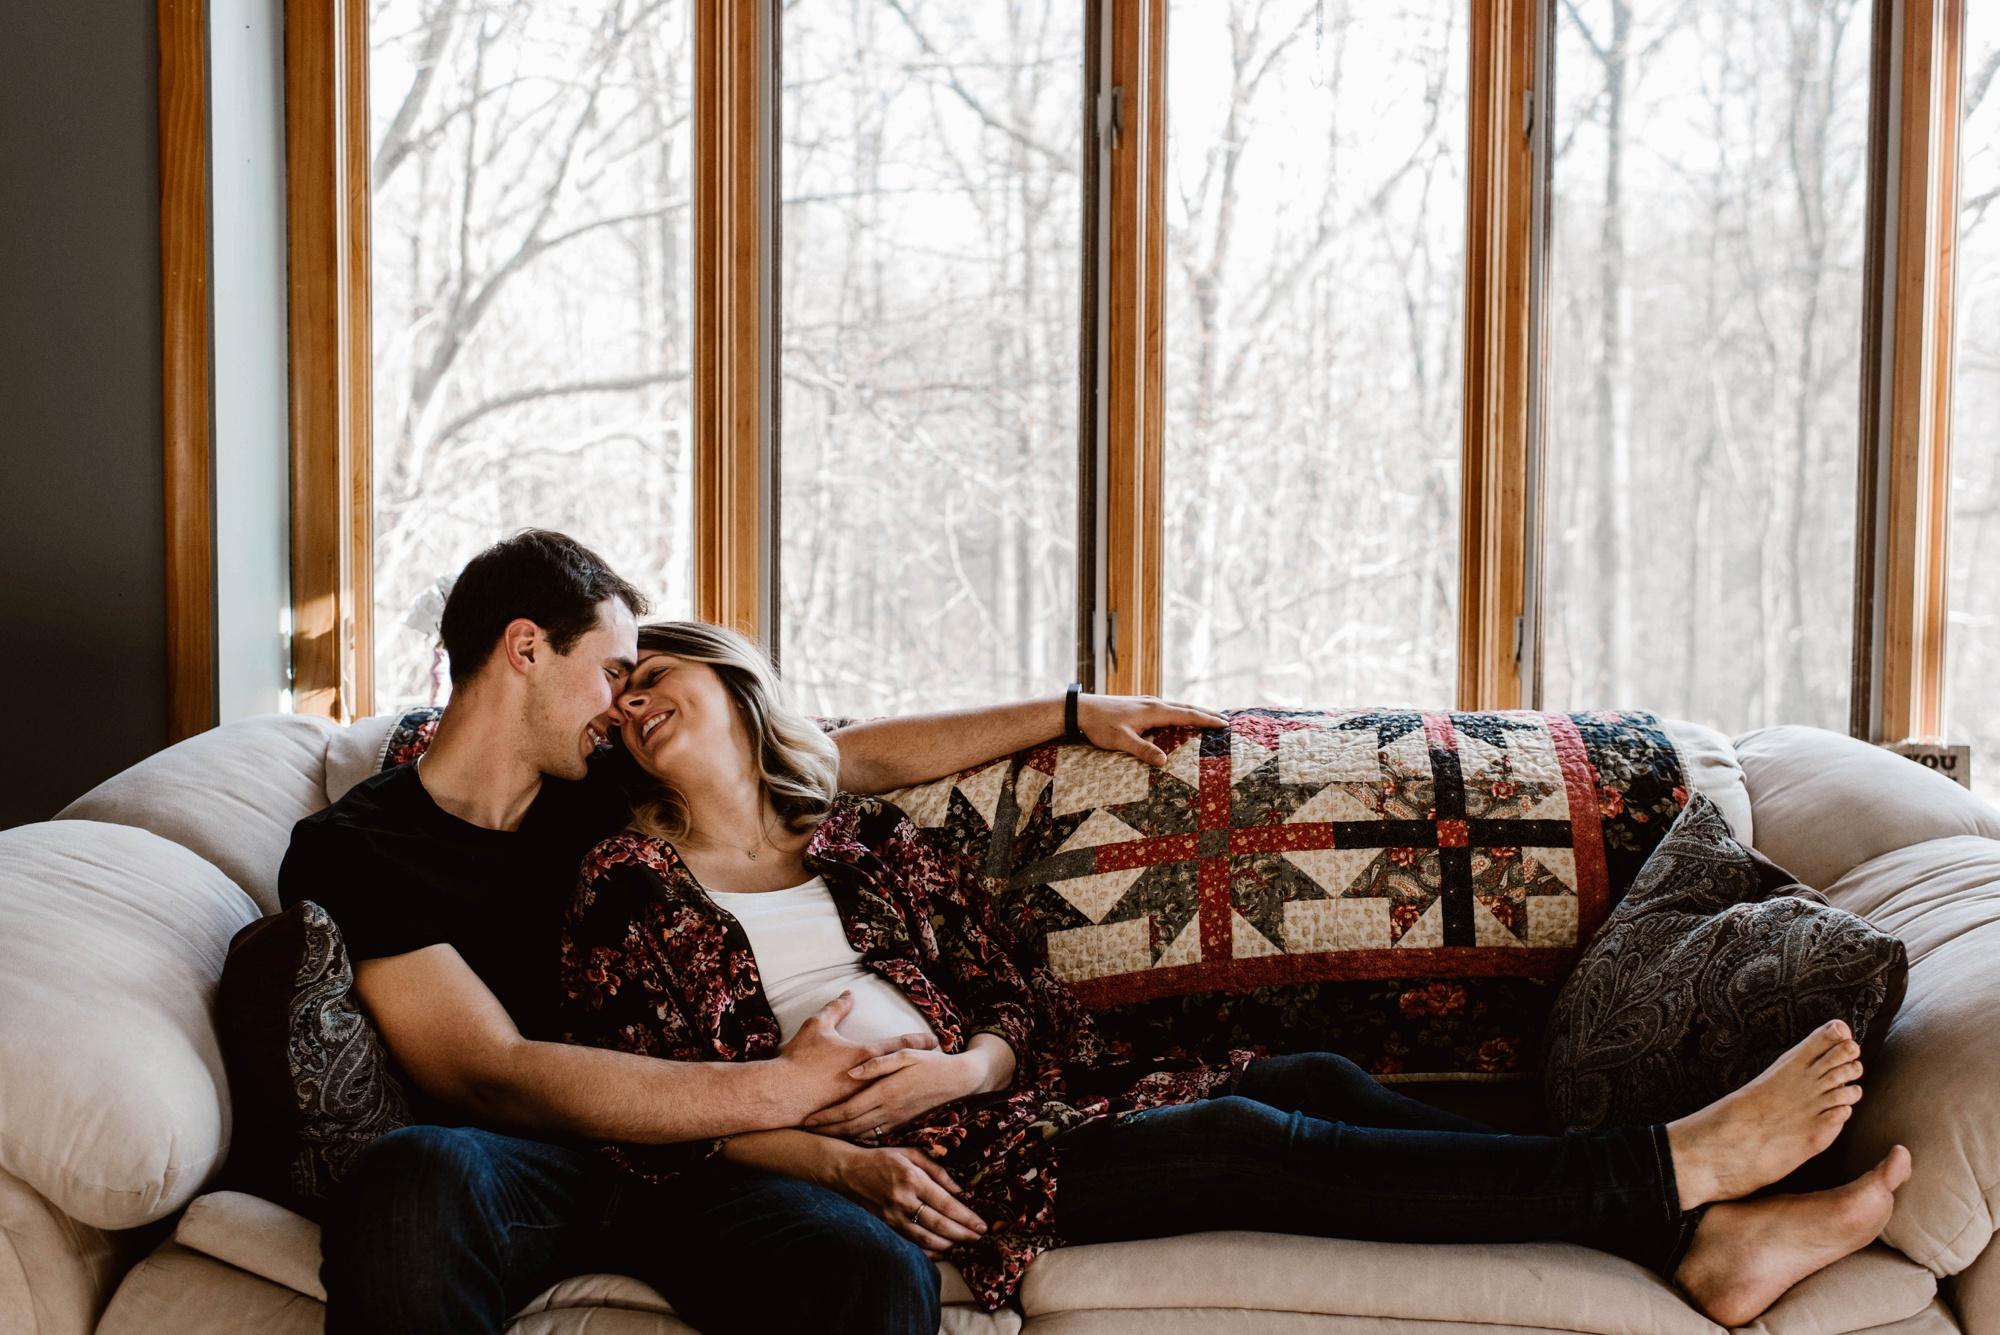 maternity-danielle-b-lauren-grayson-cleveland-akron-canton-ohio-photographer-family-maternity-photography-session-photos-_0007.jpg